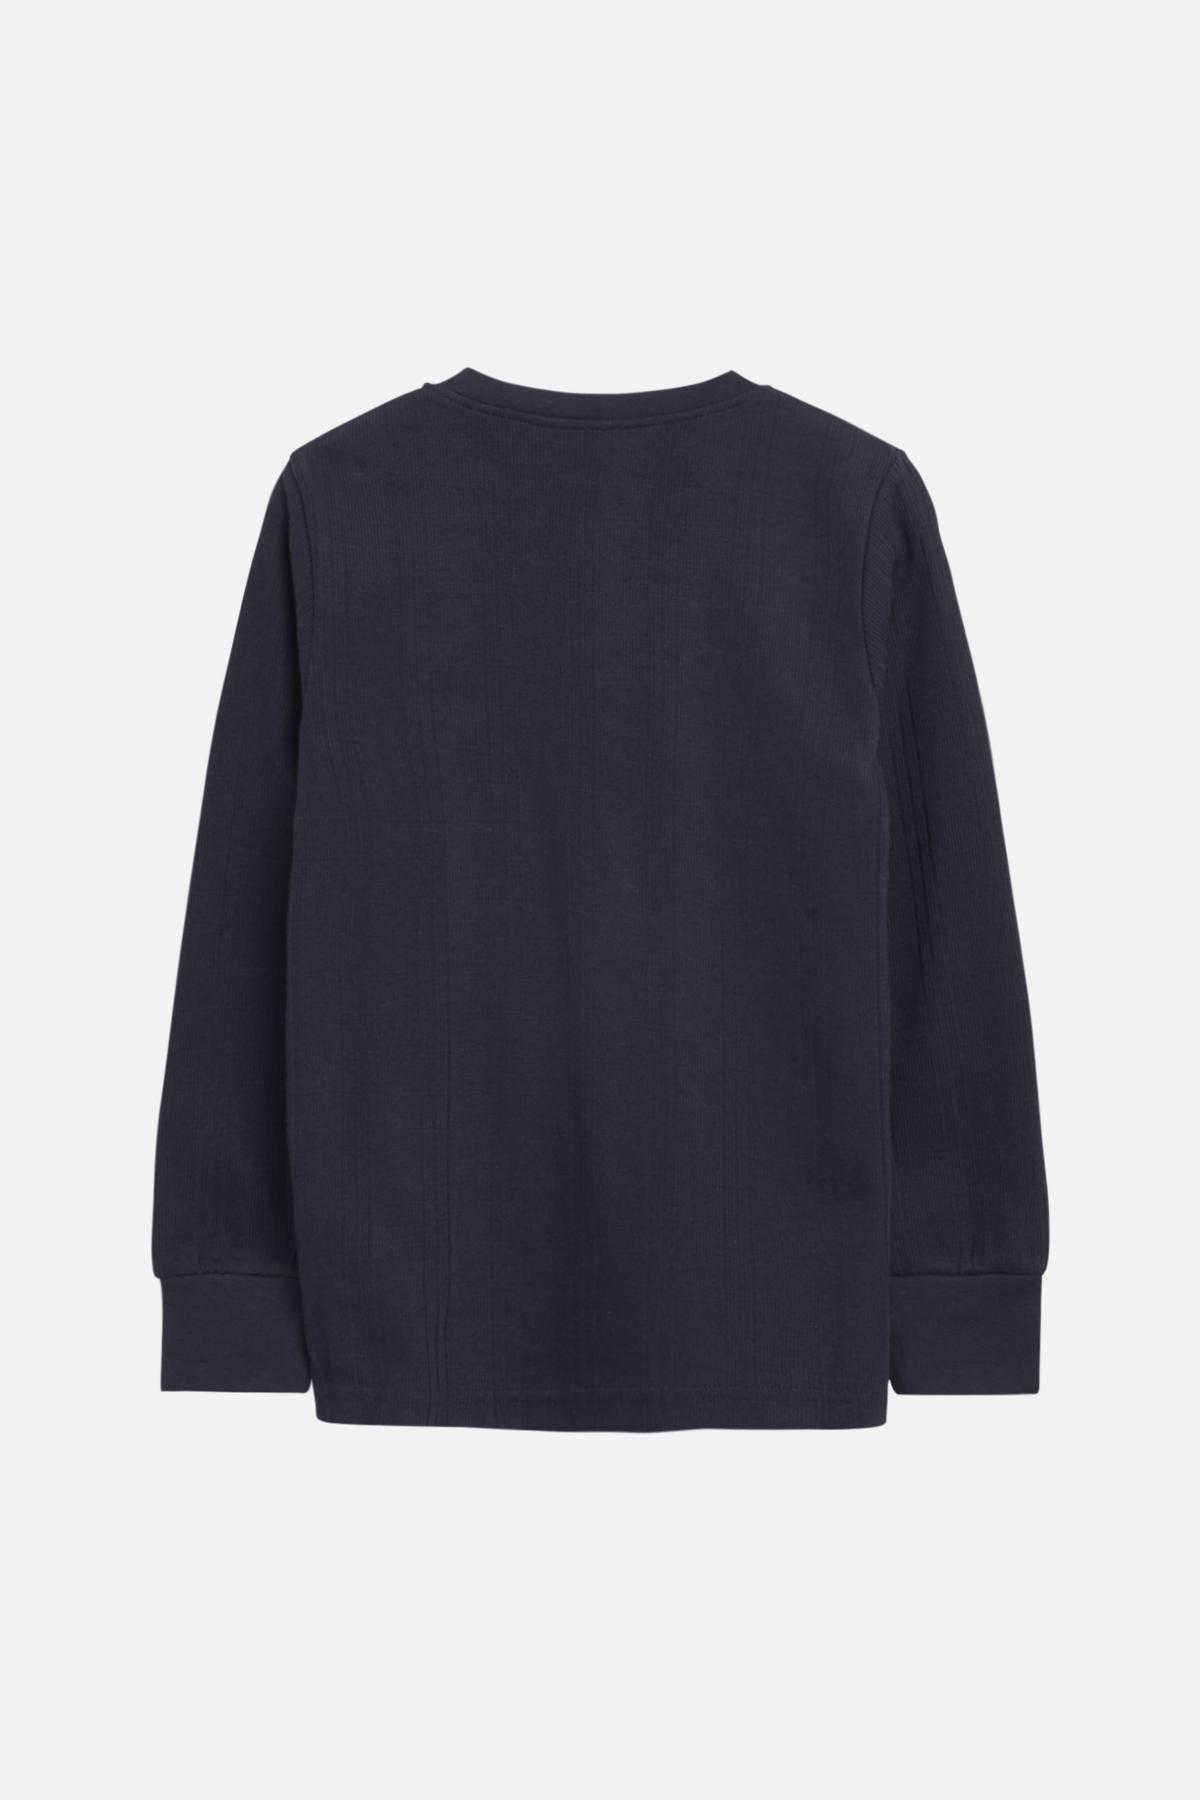 Boy - Adrien - T-shirt L/S